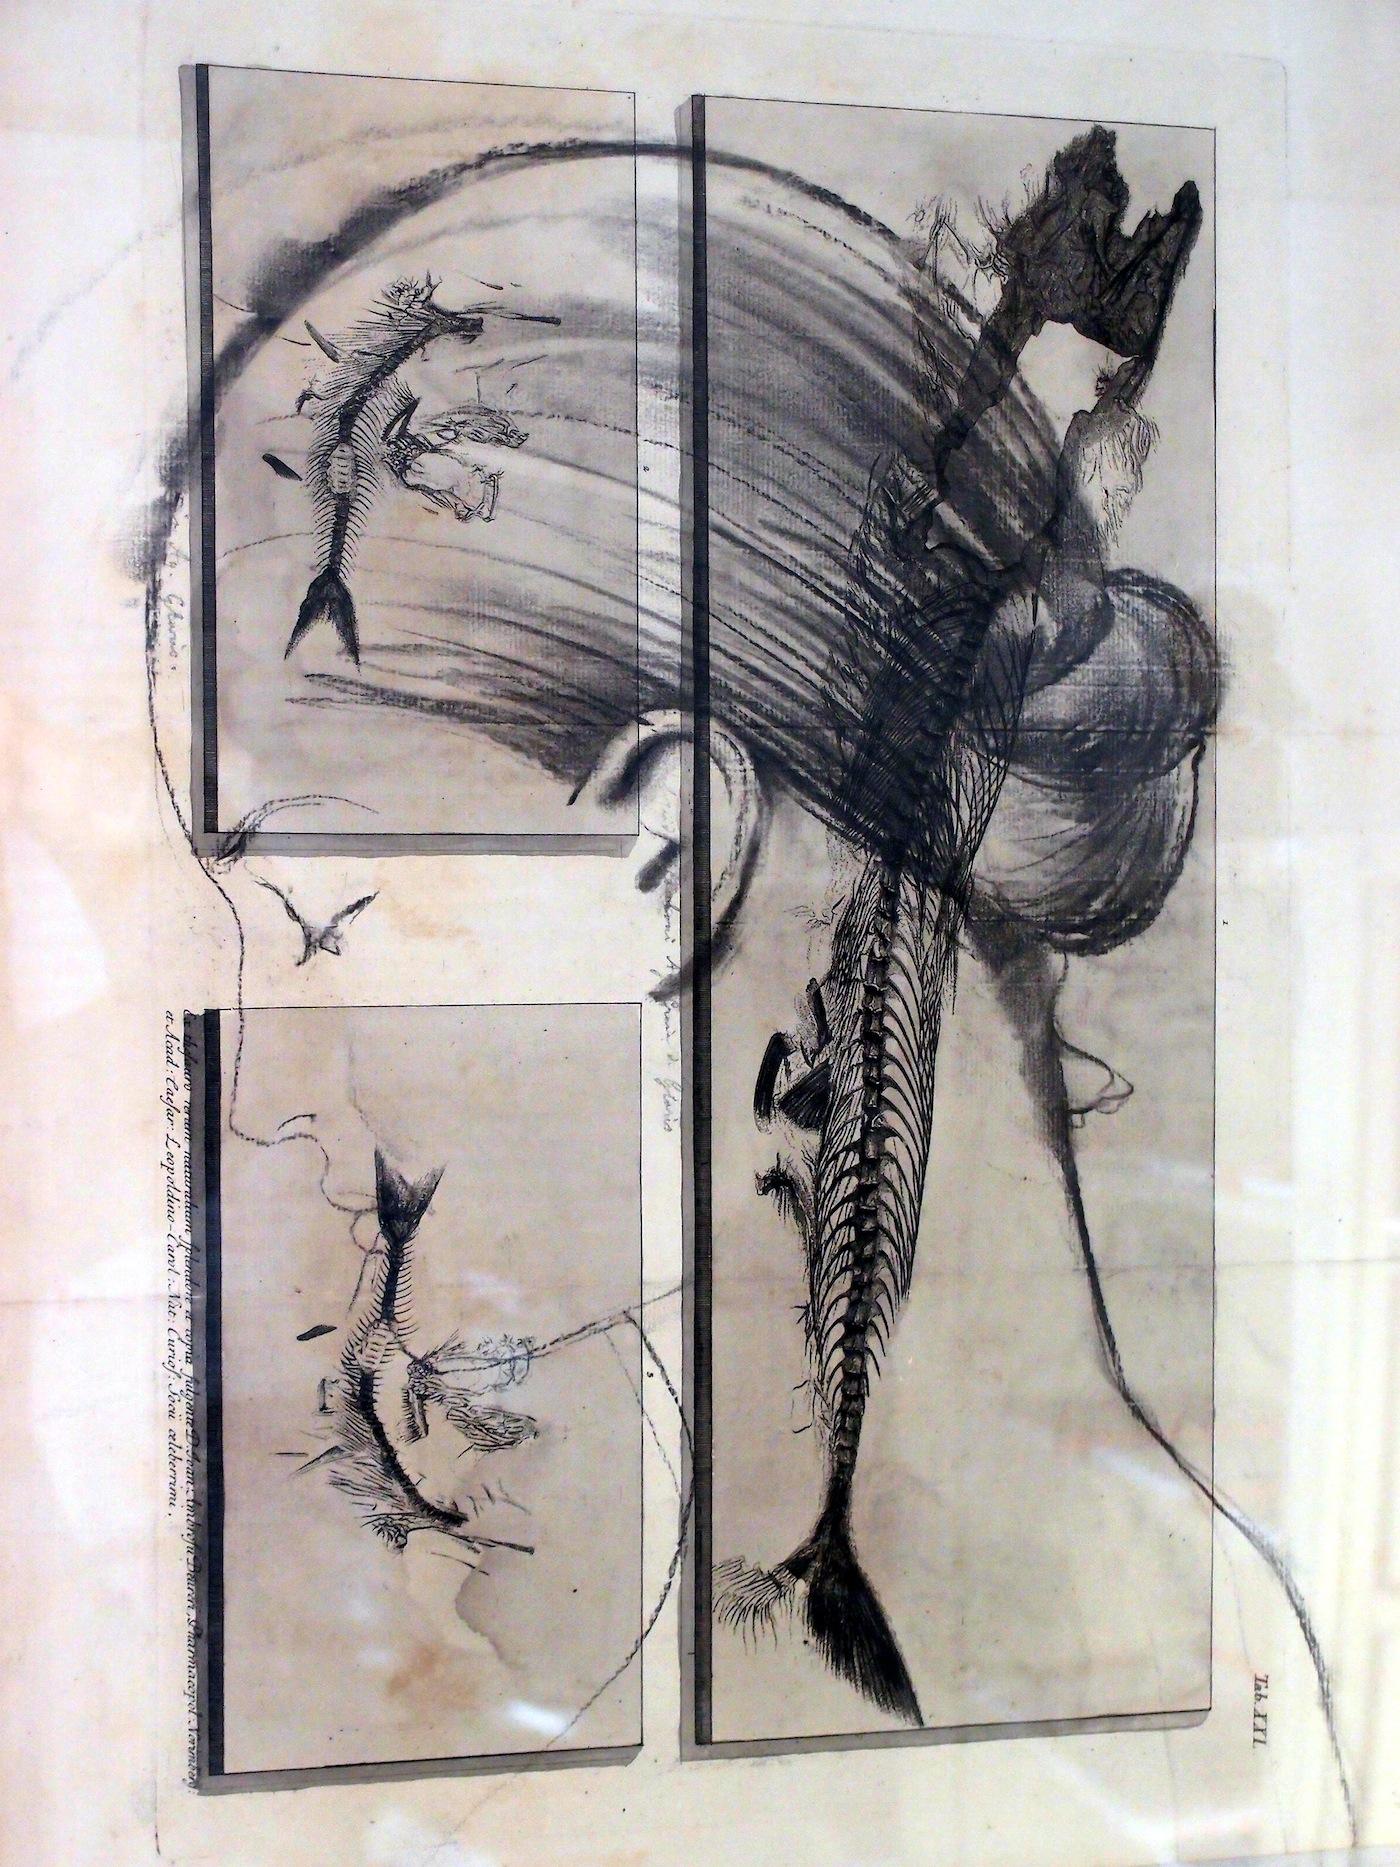 Omar Galliani, OMAR/ROMA/AMOR,2012,11 carboncini su carta antica,cm 55x45